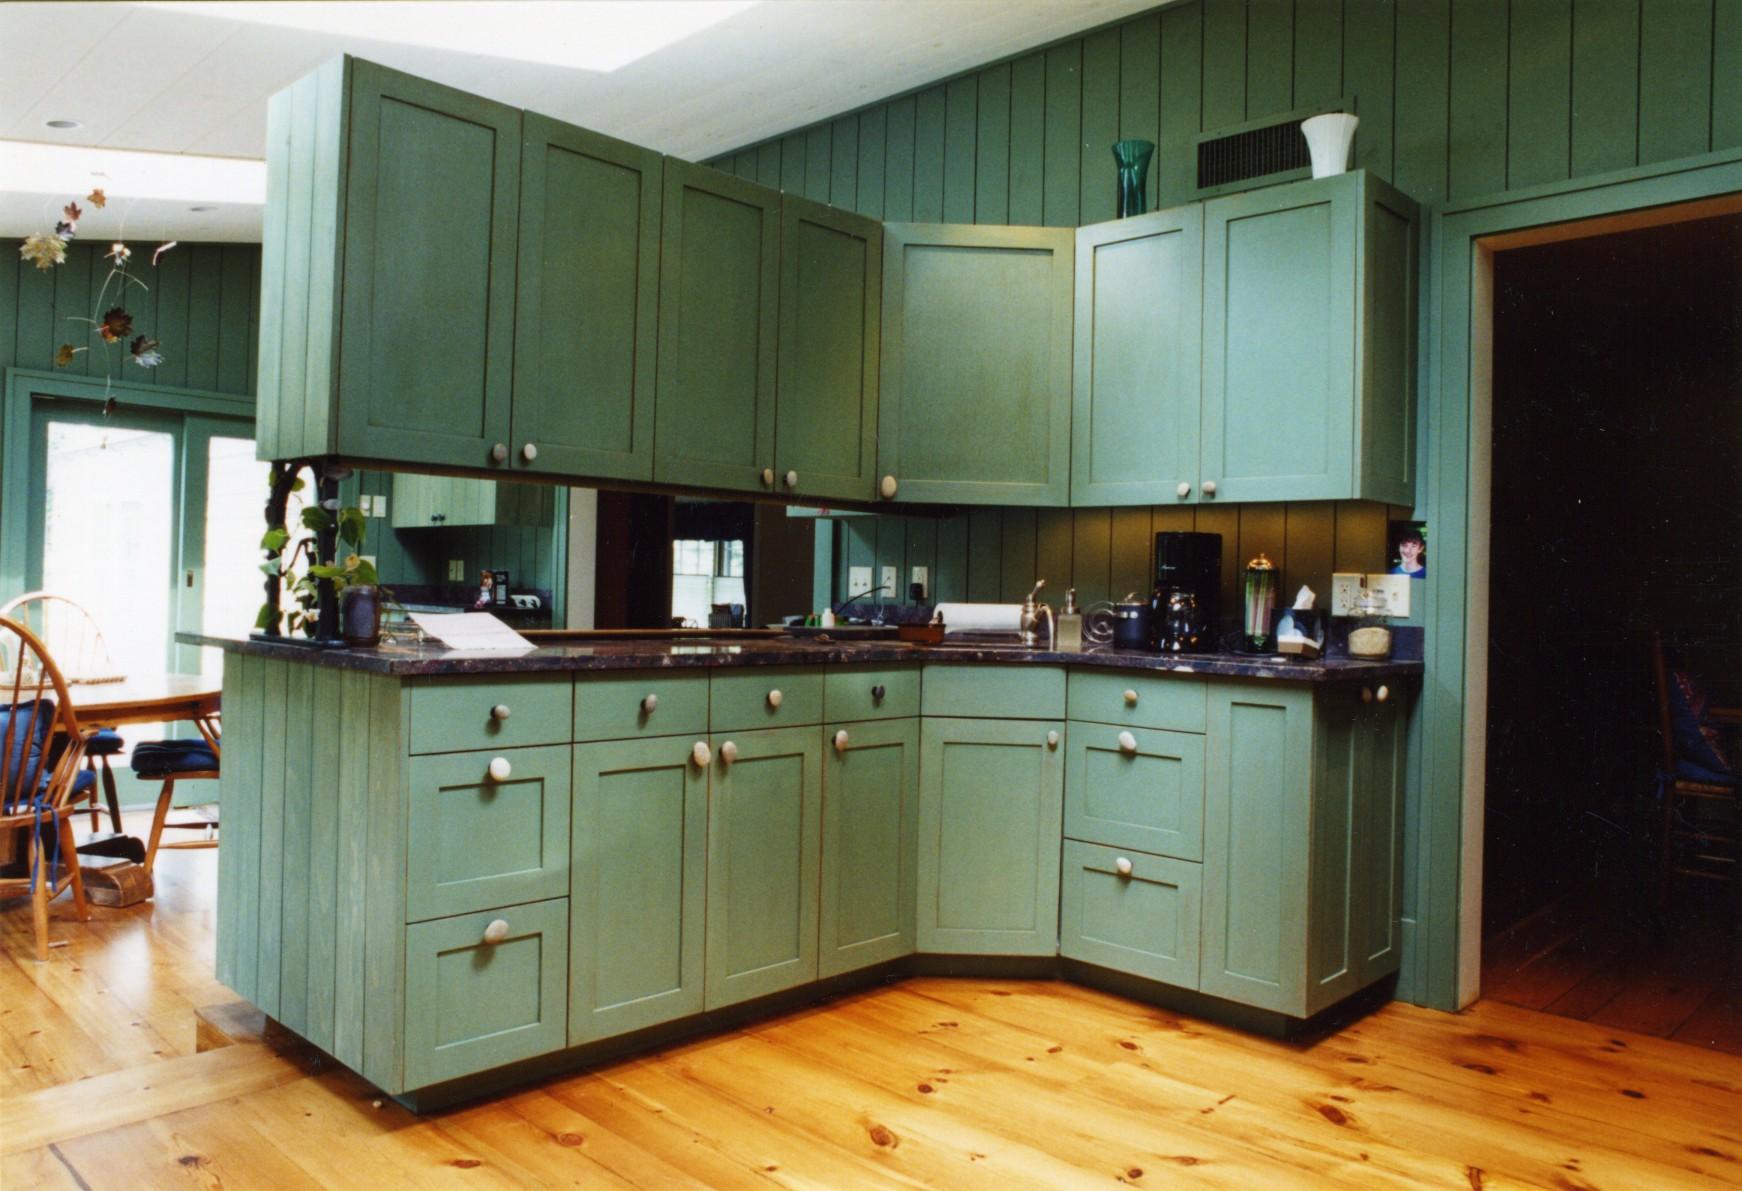 Custom cabinets and flooring